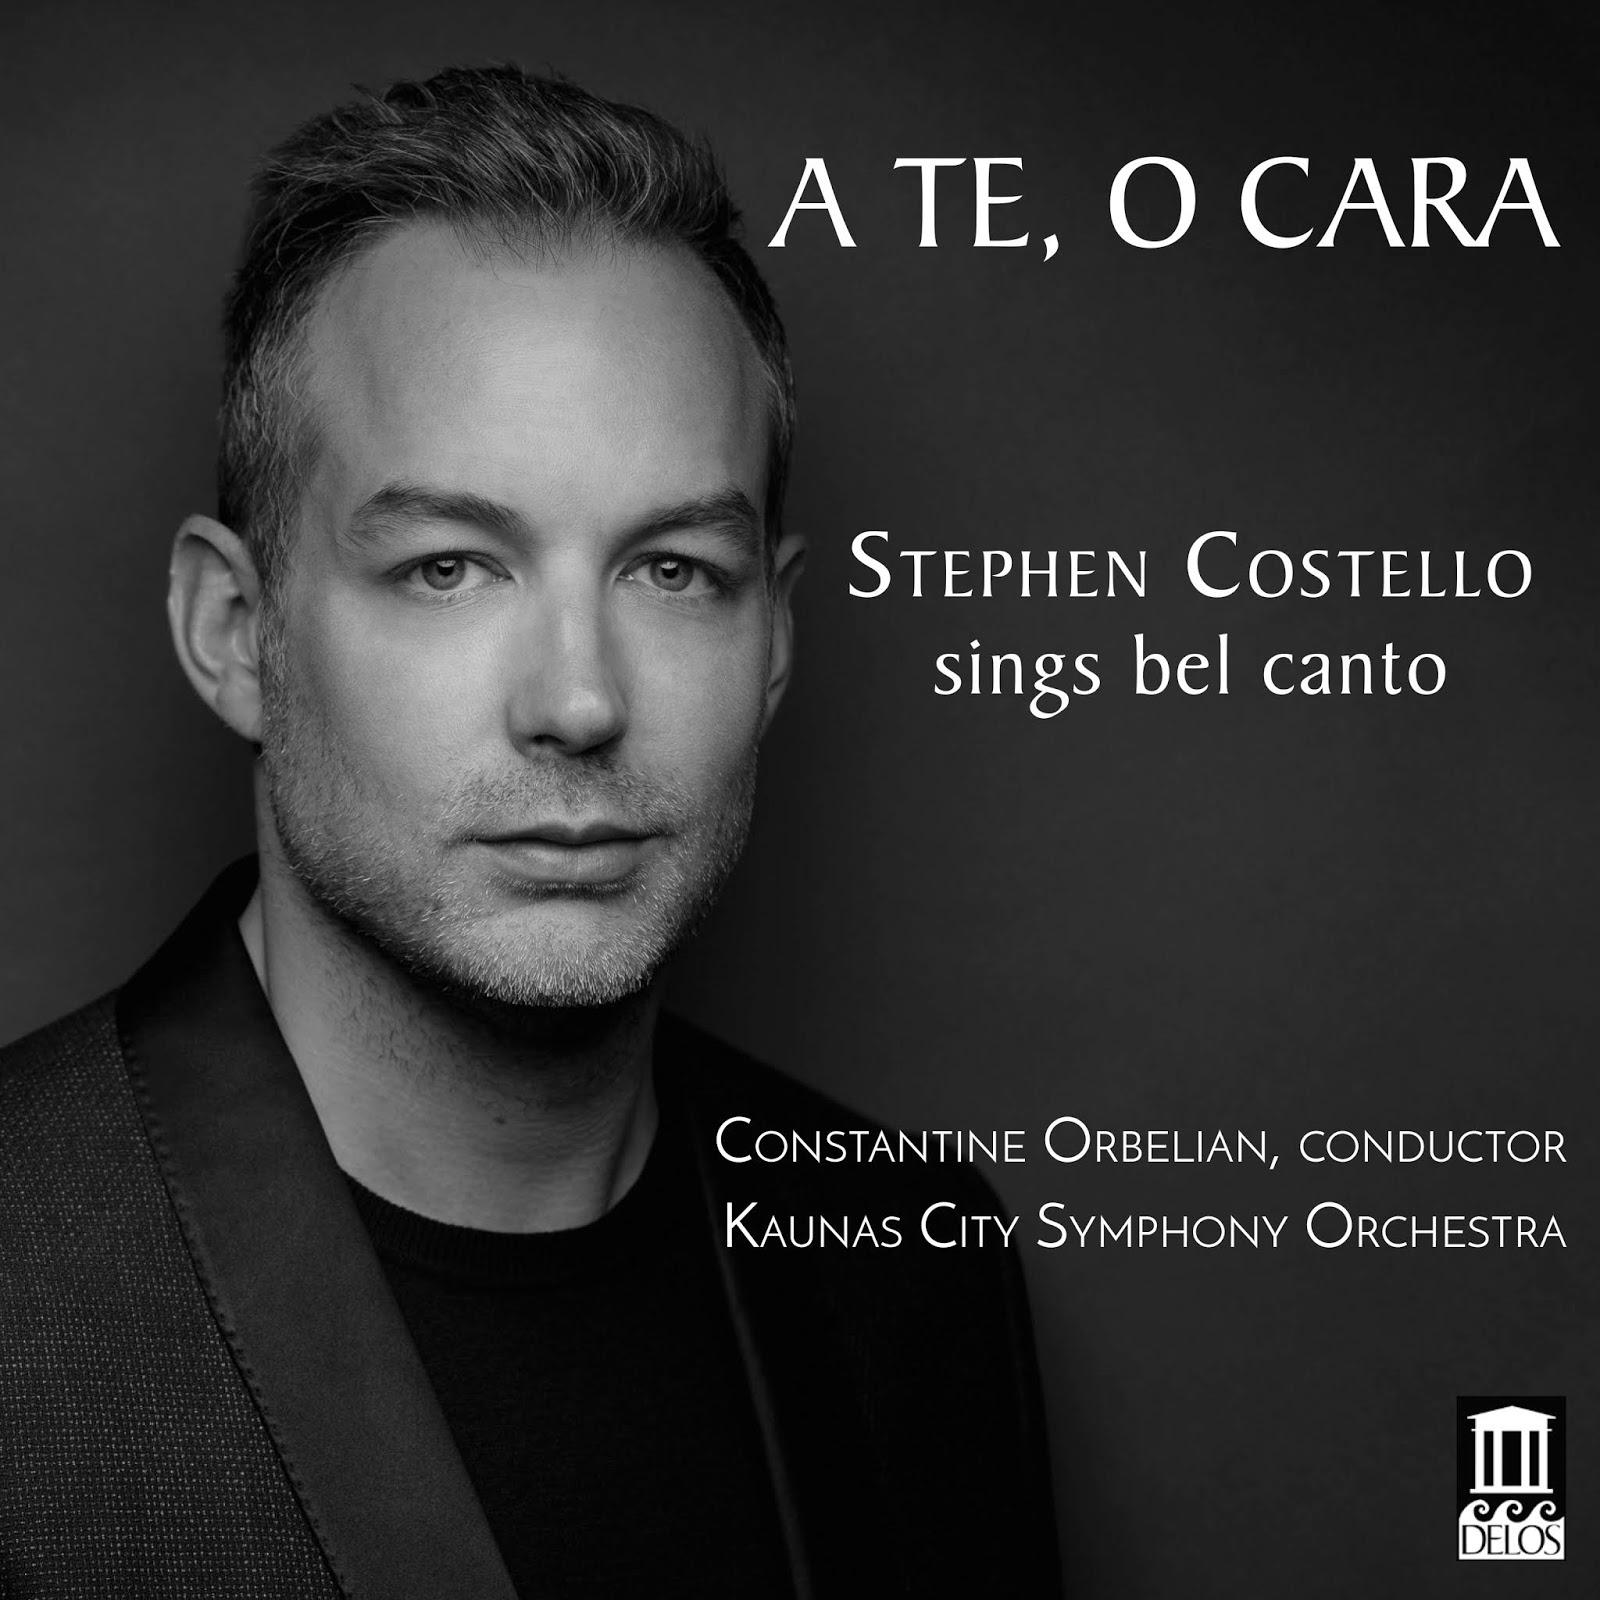 BEST VOCAL RECITAL DISC OF 2018: A TE, O CARA - Stephen Costello sings bel canto (Delos DE 3541)